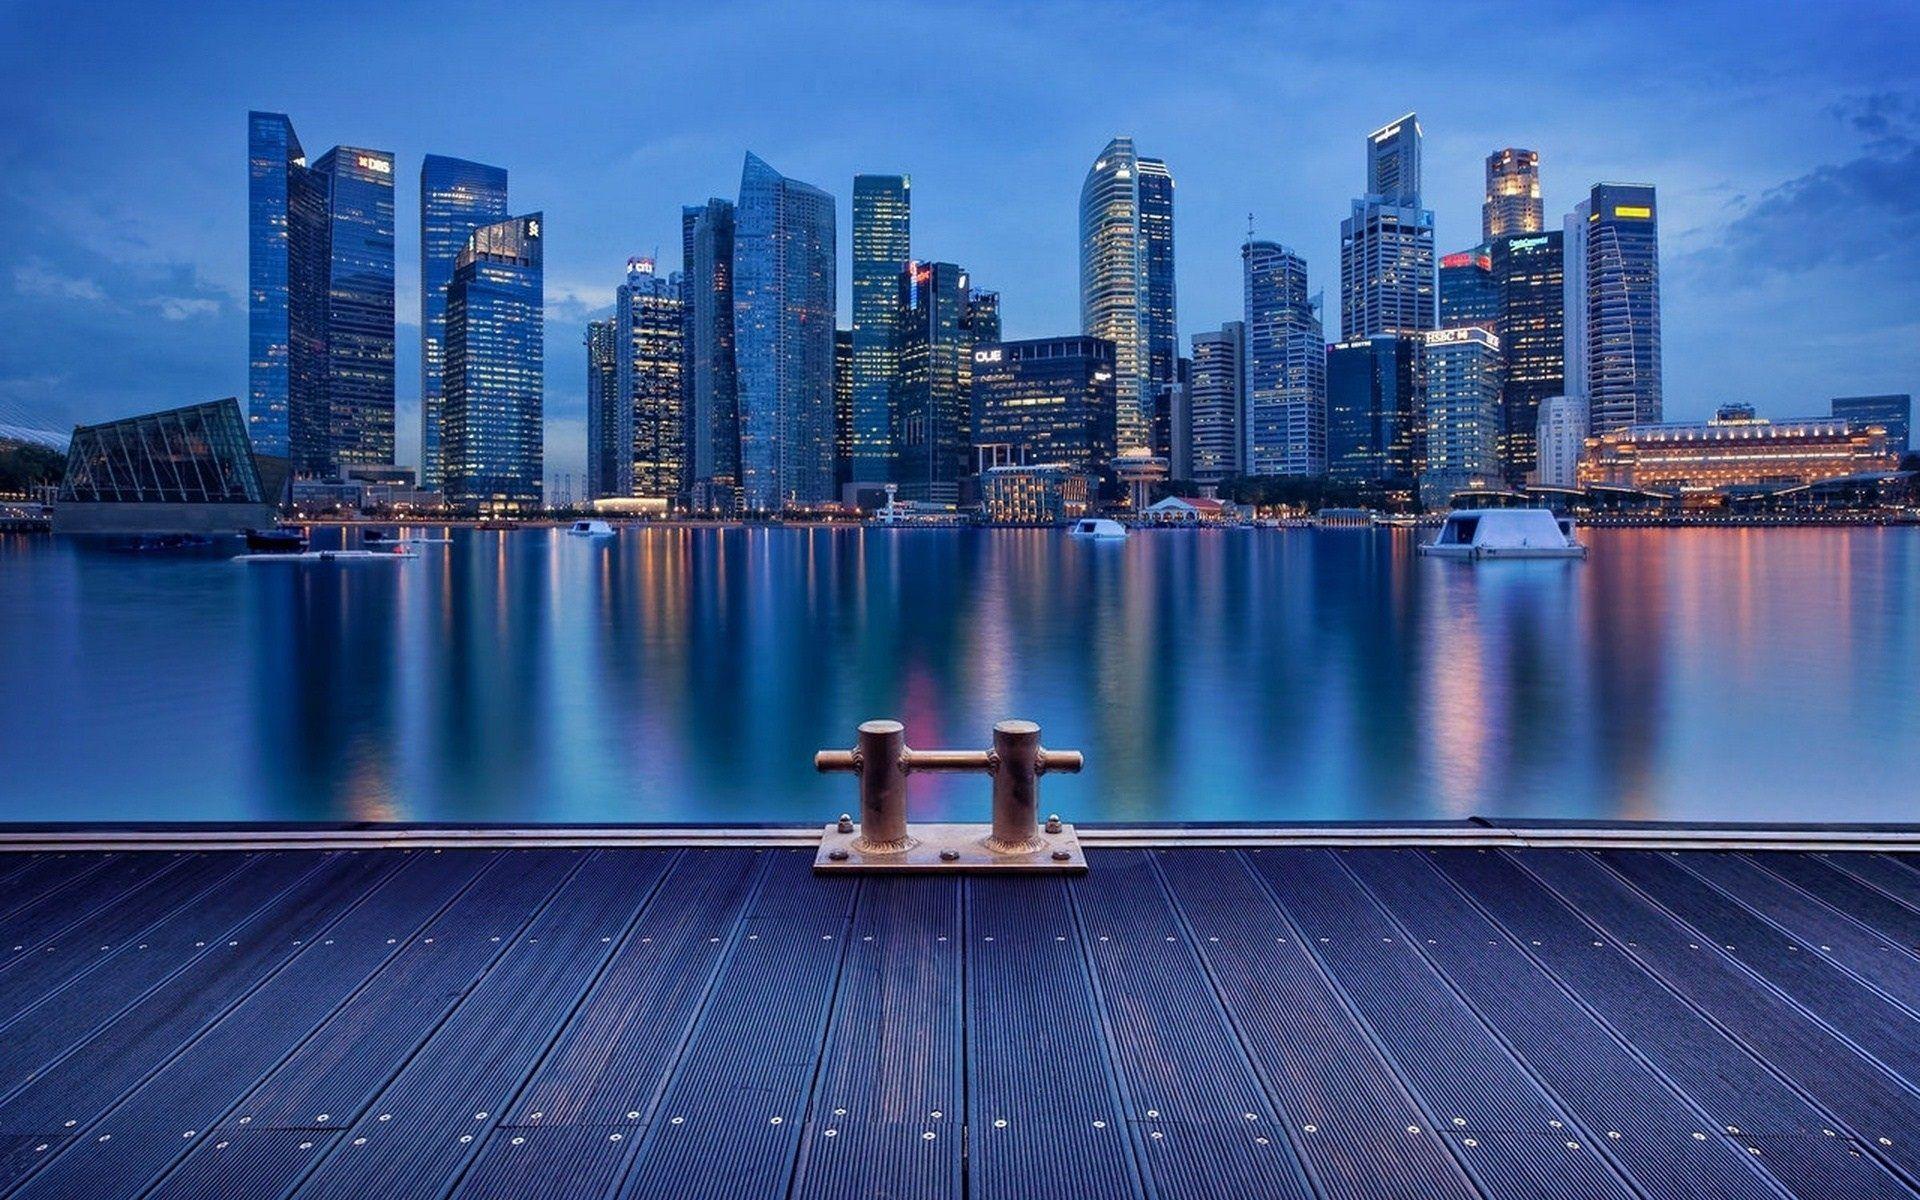 City Night View Wallpaper Hd Download For Desktop Mobile 도시 배경화면 스카이라인 도시